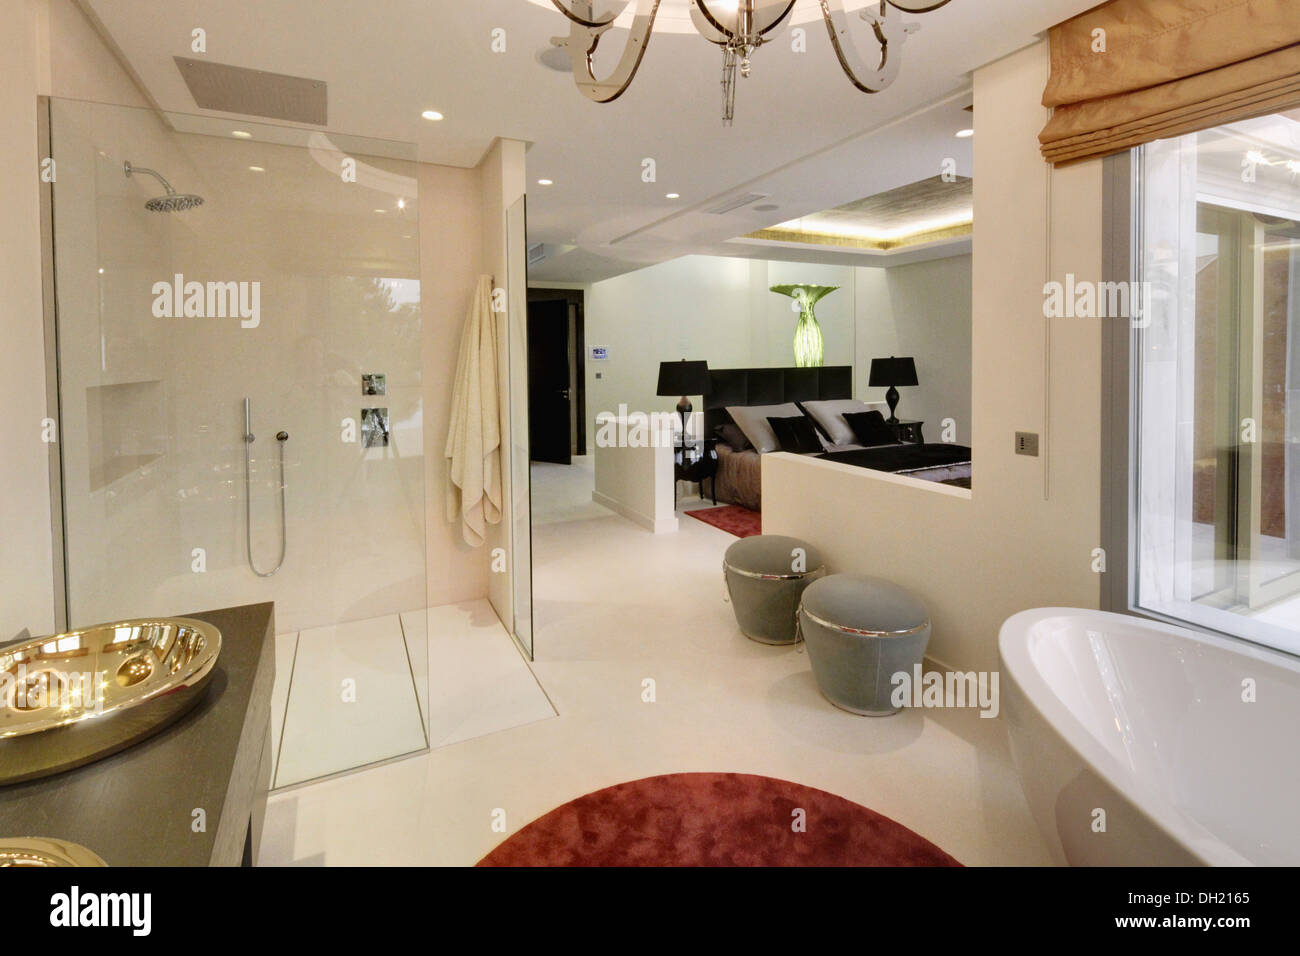 Large Walk In Shower And Gray Stools In Open Plan En Suite Bathroom In  Modern Spanish Apartment Bedroom